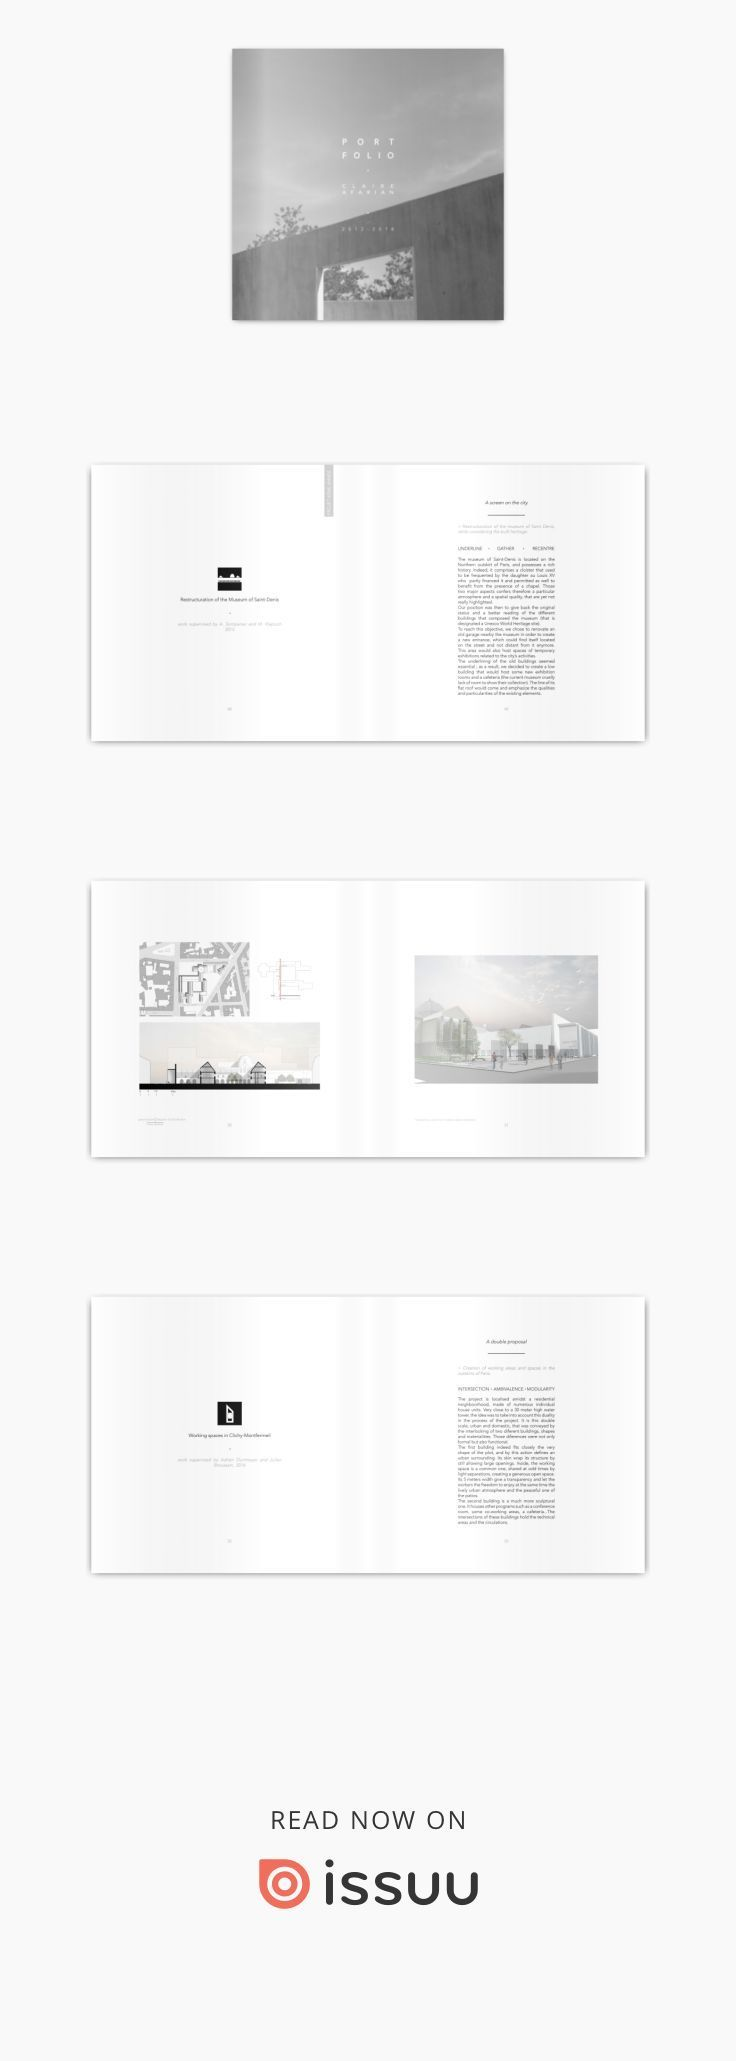 Architektur Portfolio #architectureportfolio #architektur #portfolio